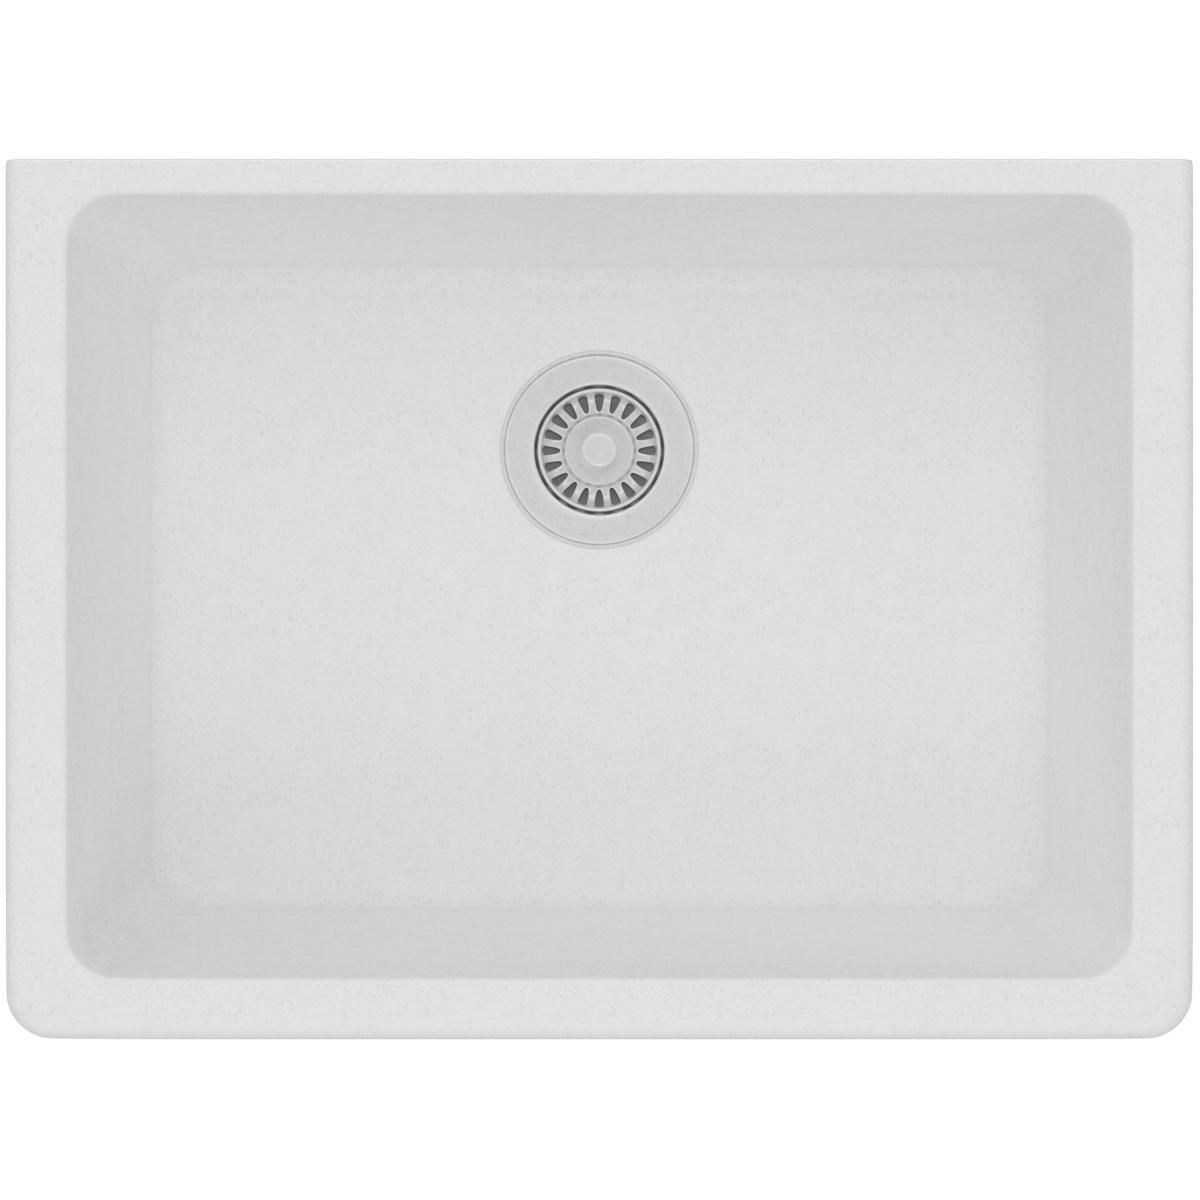 Elkay Quartz Classic ELGU2522WH0 Single Bowl Undermount Sink, White by Elkay